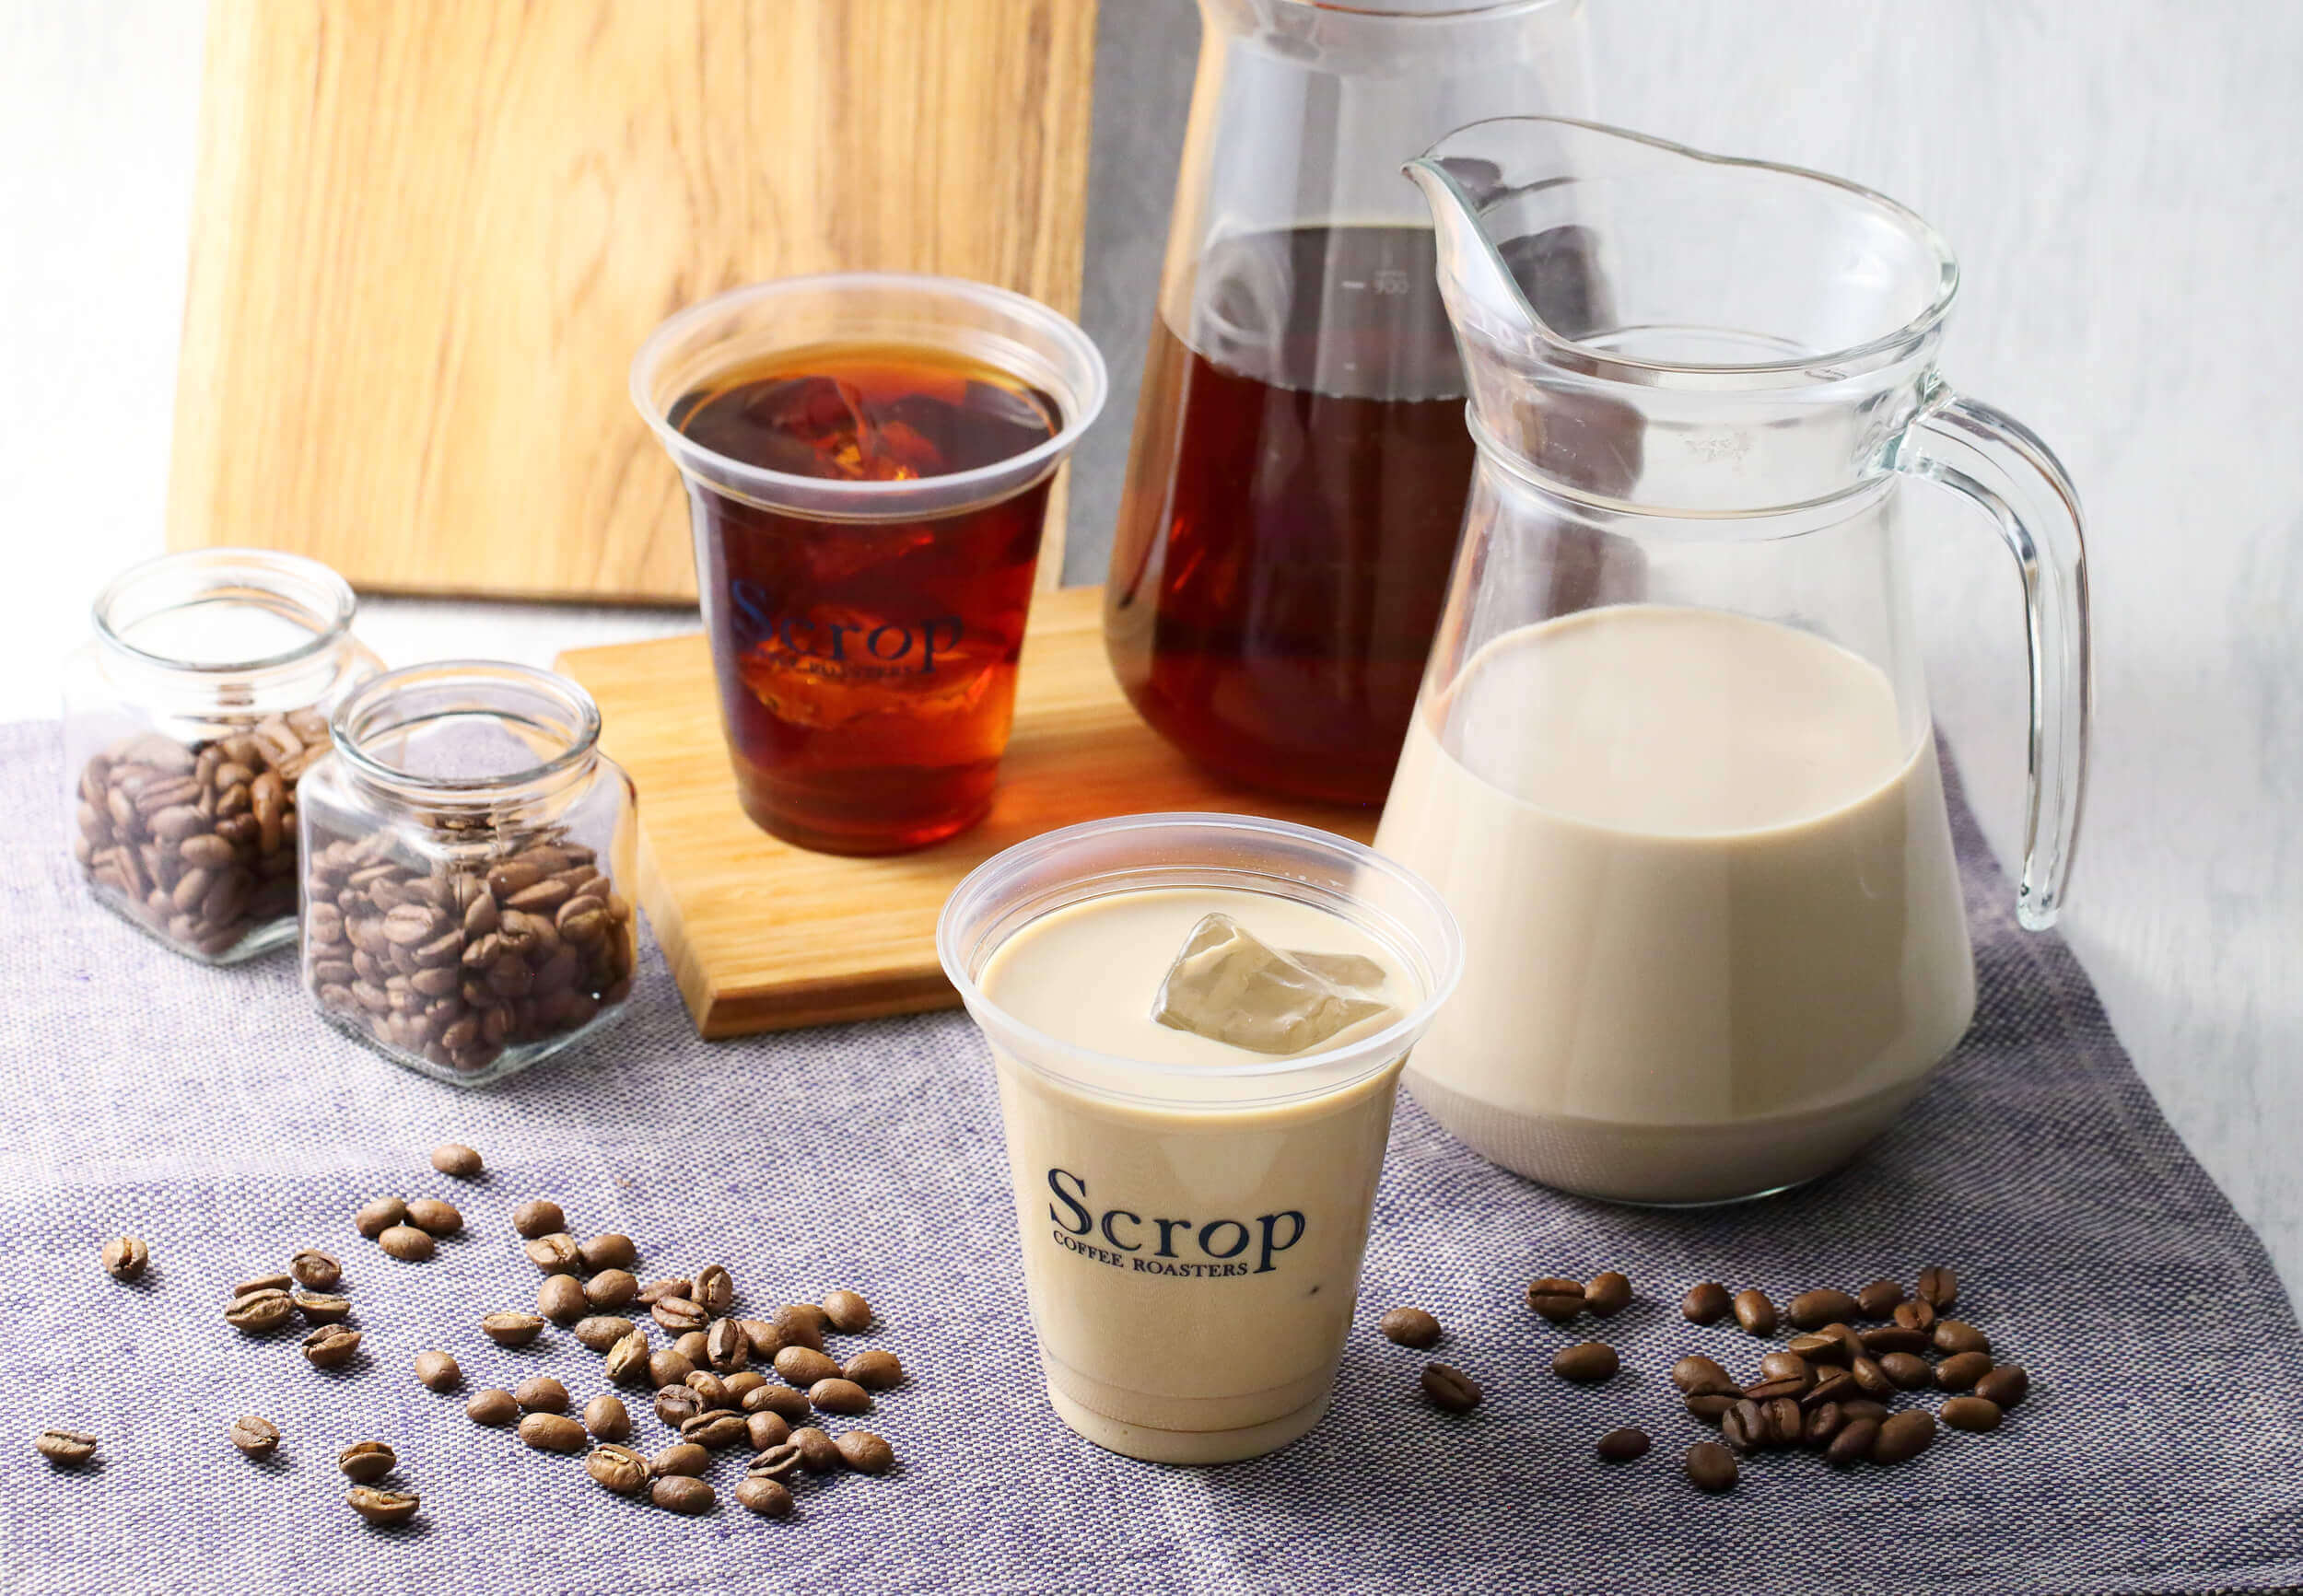 Scrop COFFEE ROASTERS(スクロップ コーヒー ロースターズ )のゲイシャミルクブリュー/¥693(税込み)